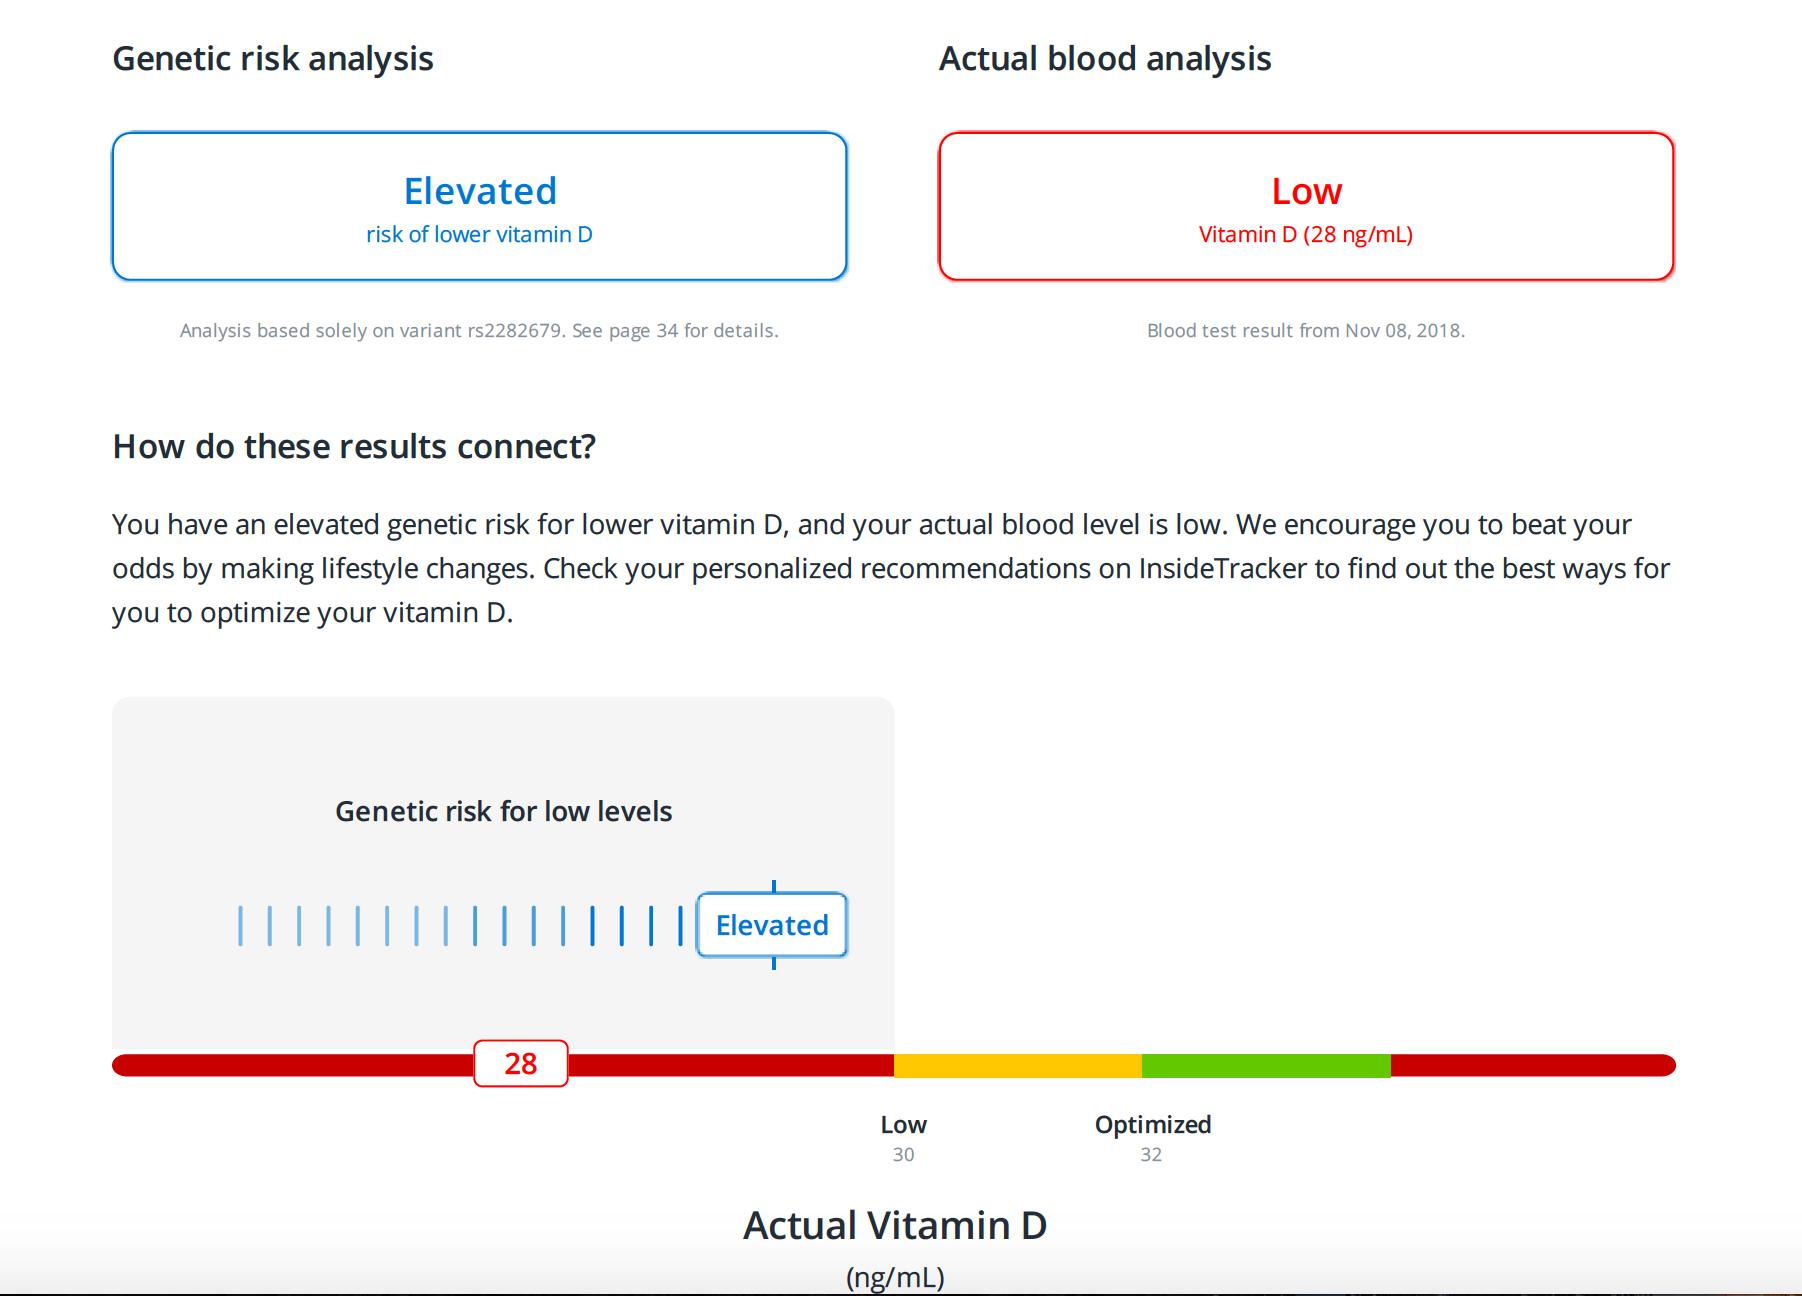 genetic risk low vitamin D